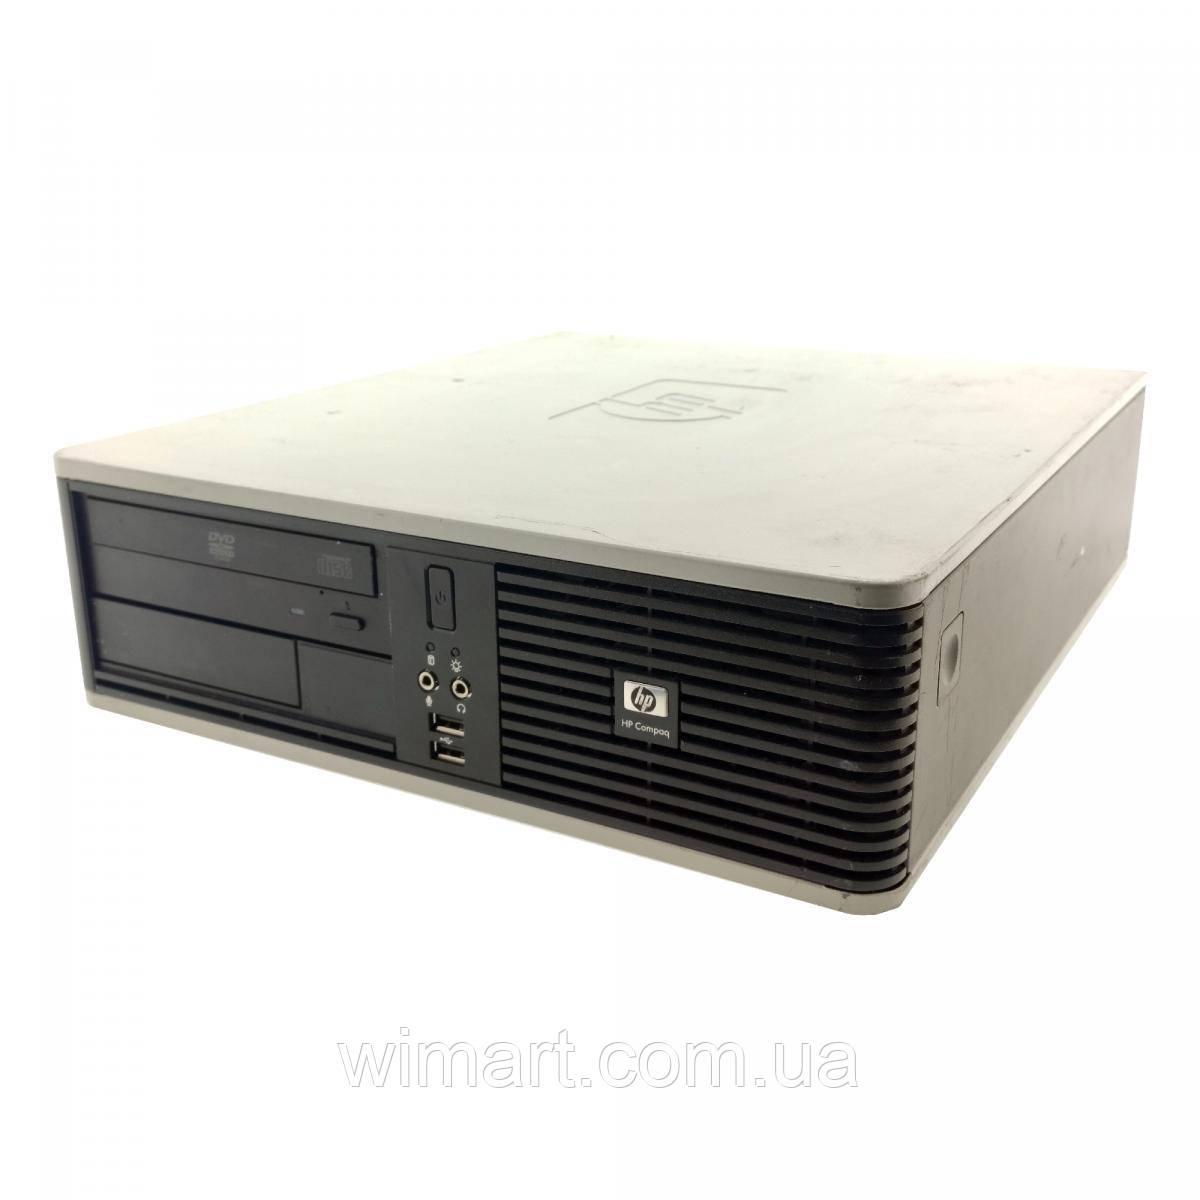 Б/У Системний блок HP dc7900 SFF Intel Dual Core E8400 2GB DDR2 noHDD Vista